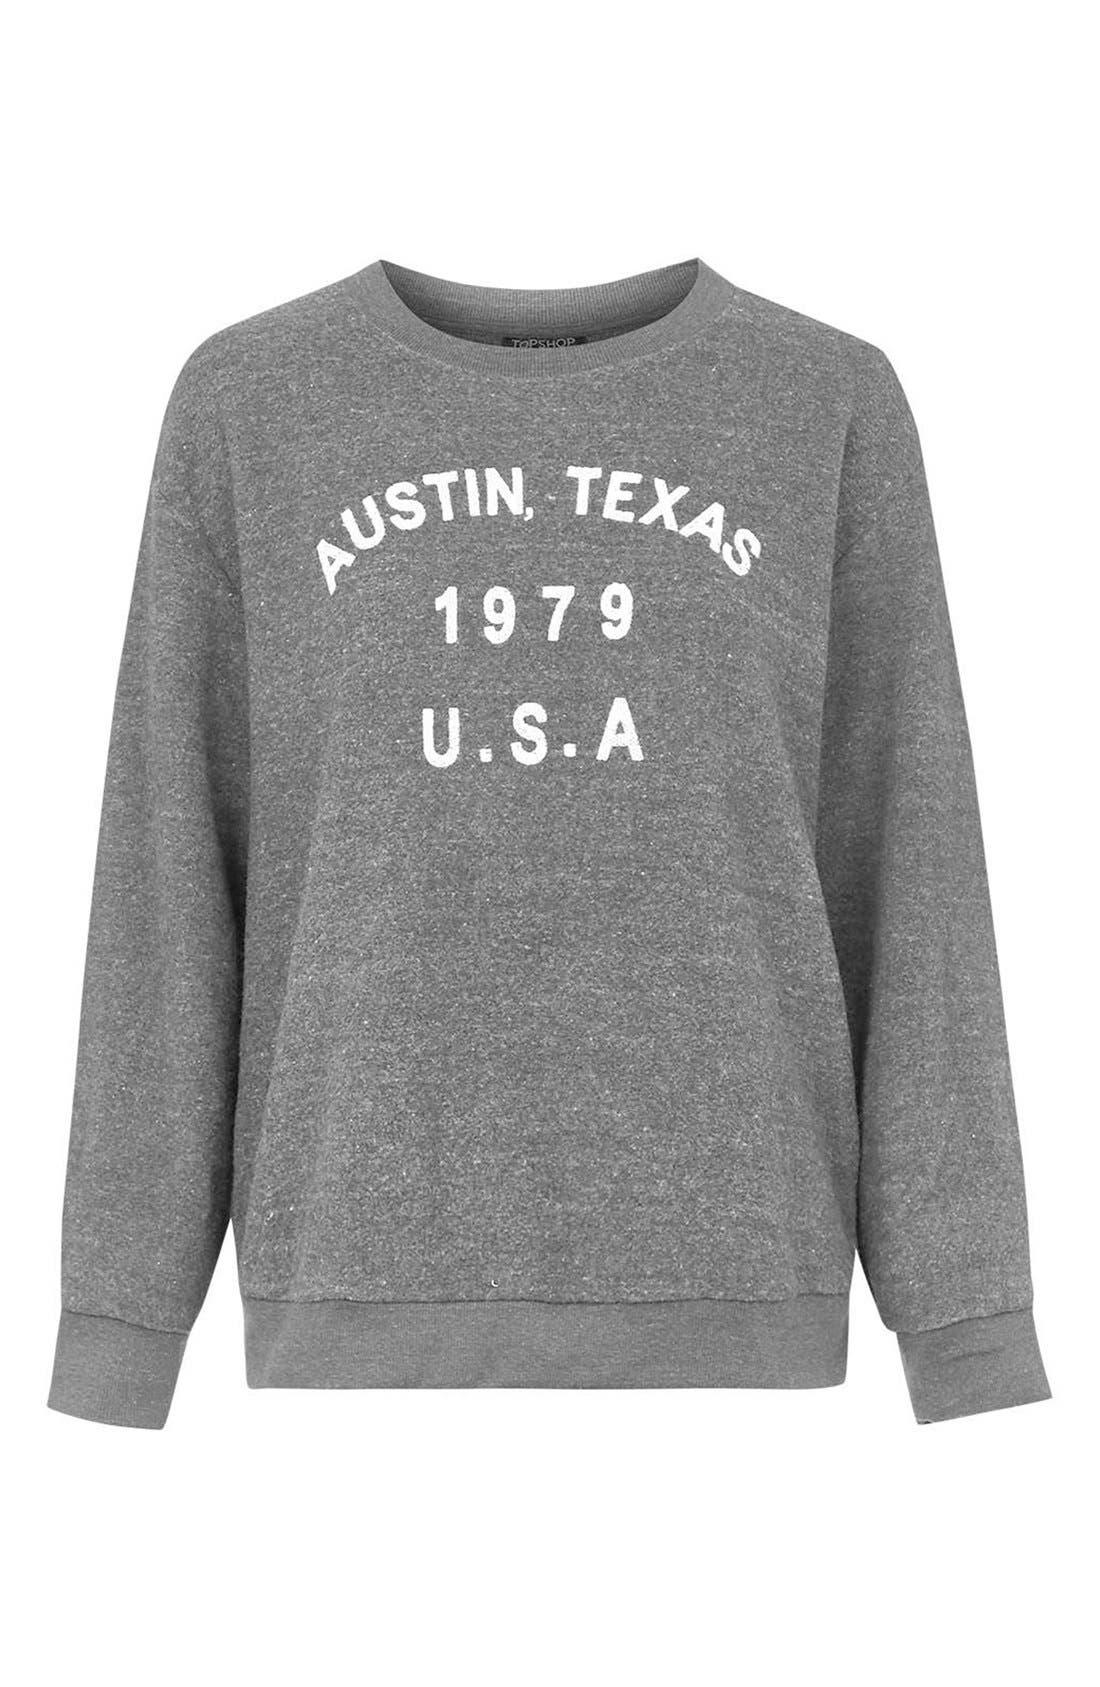 Alternate Image 4  - Topshop 'Austin, Texas' Crewneck Sweatshirt